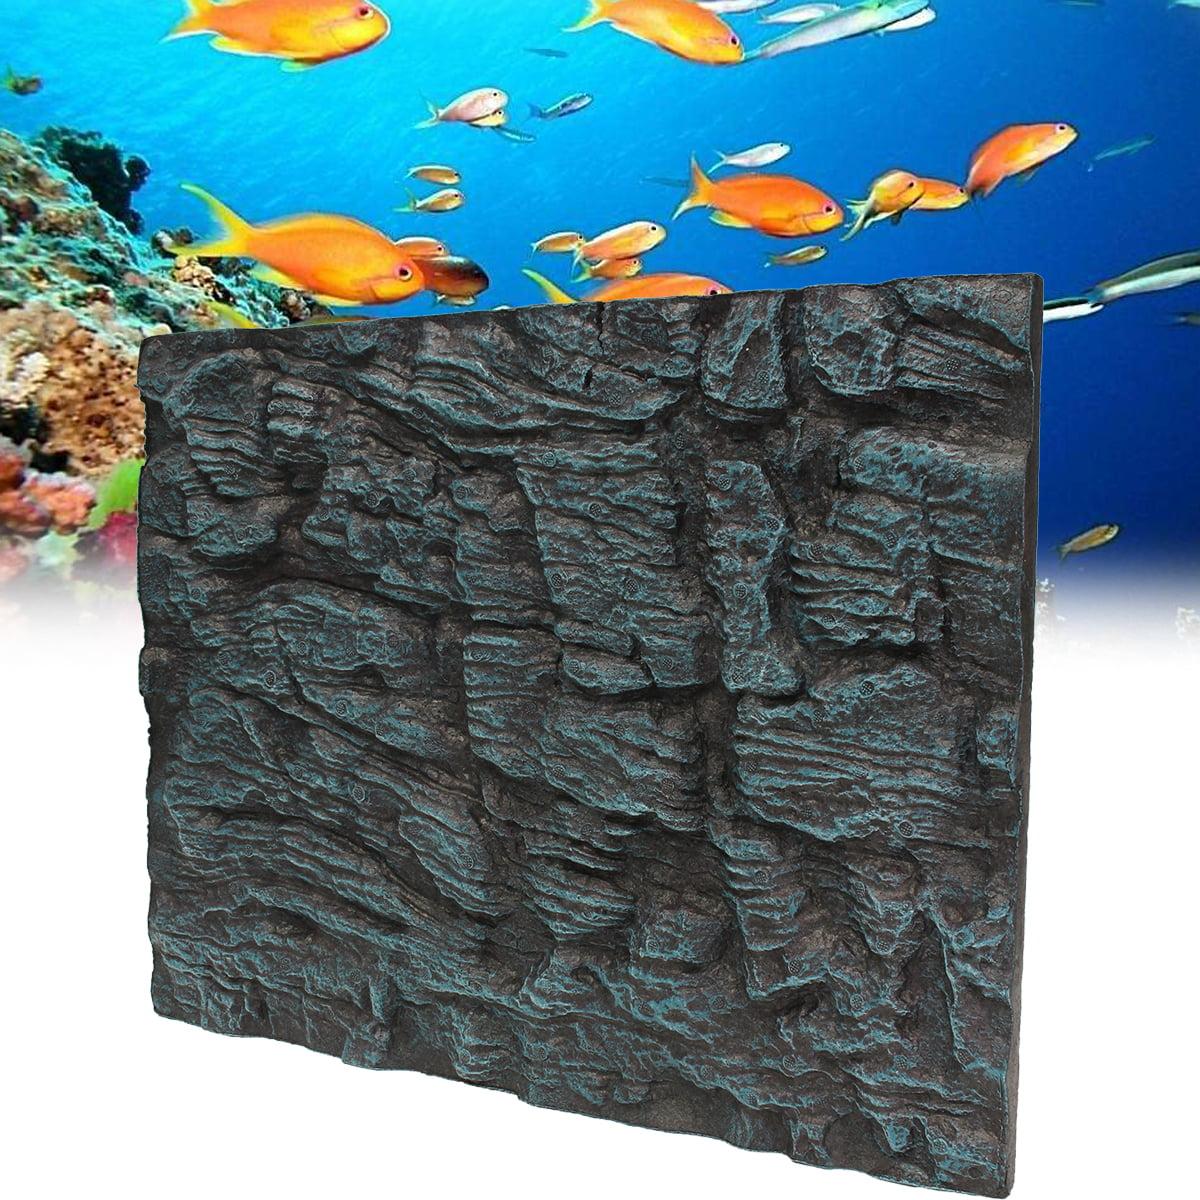 3D Foam Rock Stone Reptile Fish Tank Aquarium Background Backdrop Plate by